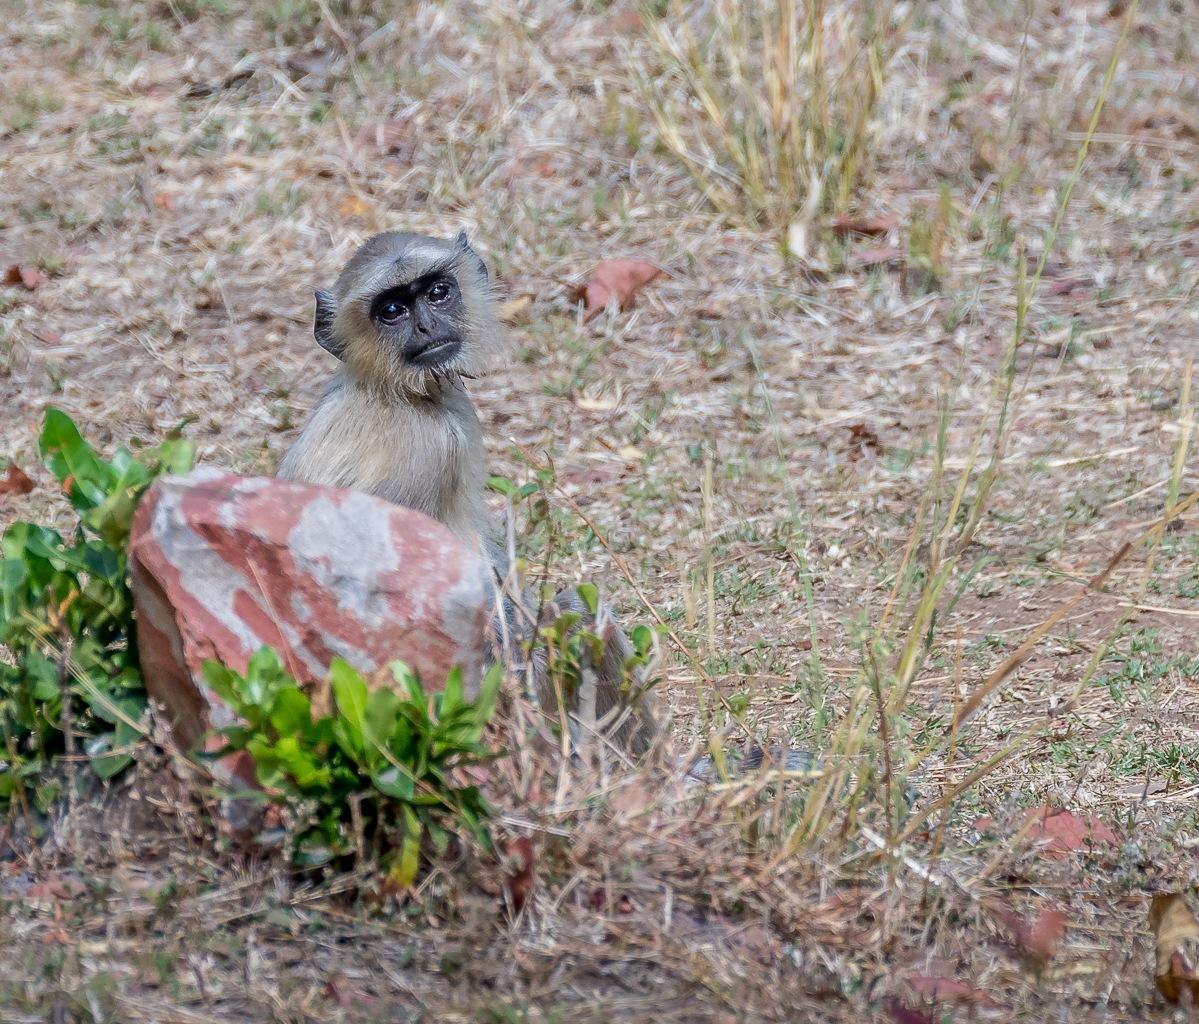 The Monkey Day by Kim Jonsson